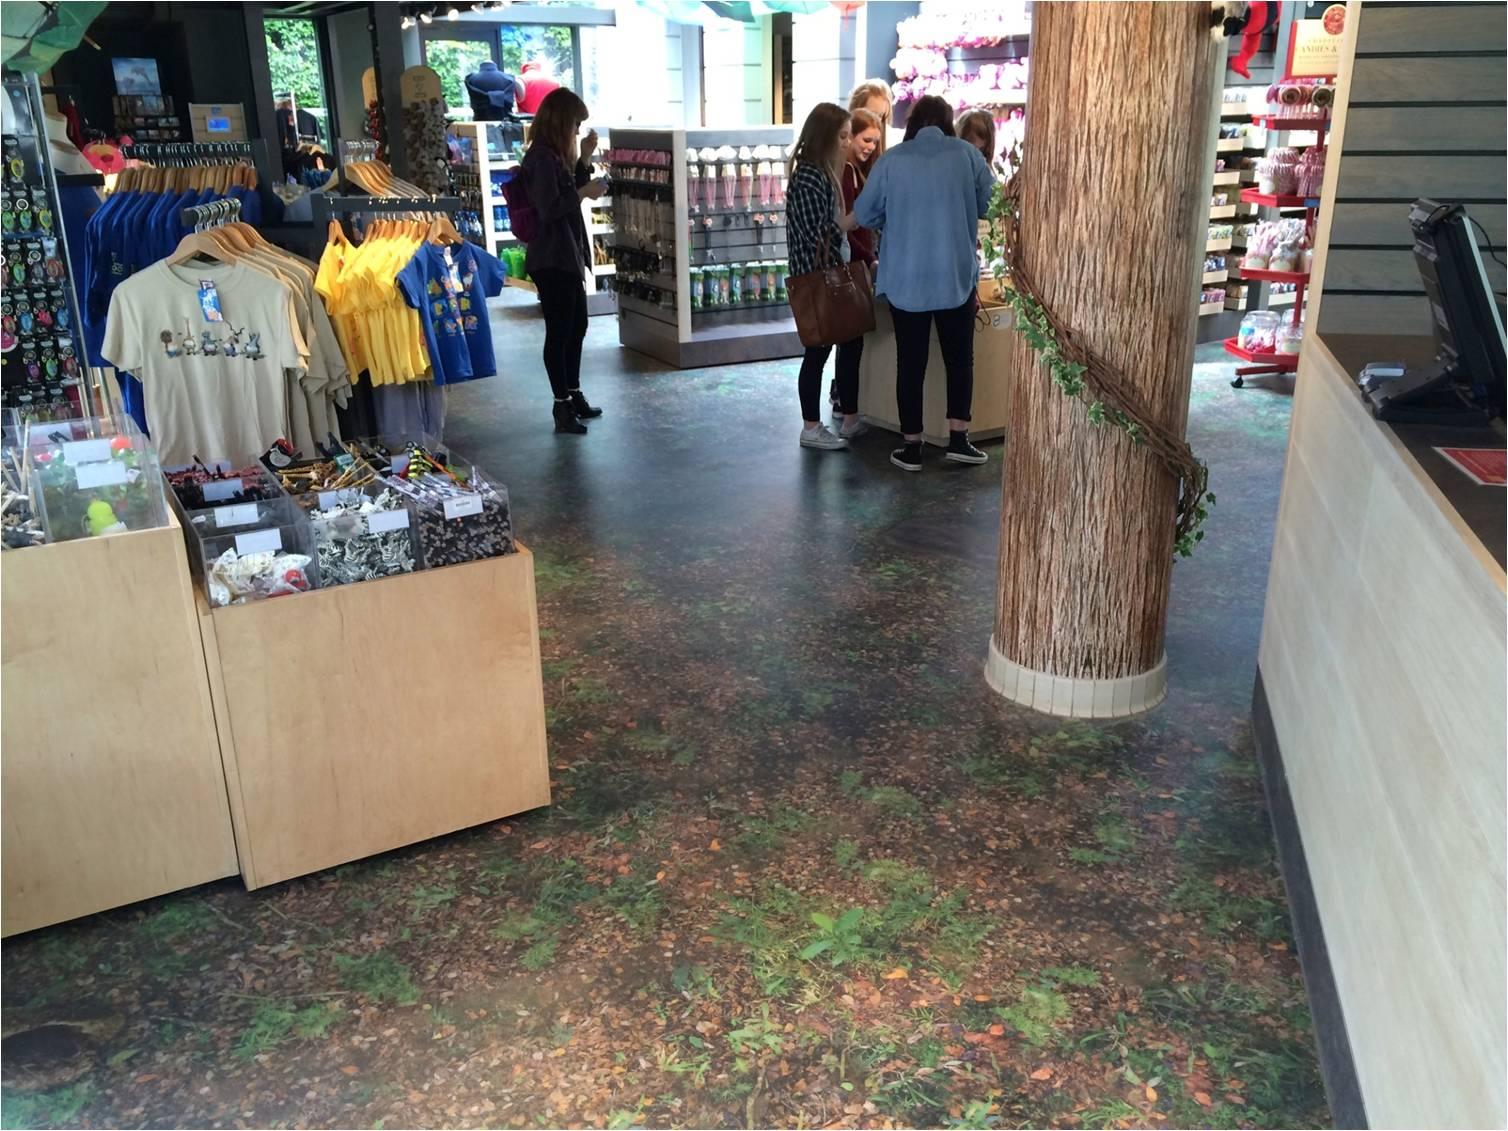 16-Museum-Retail-Store-1.jpg